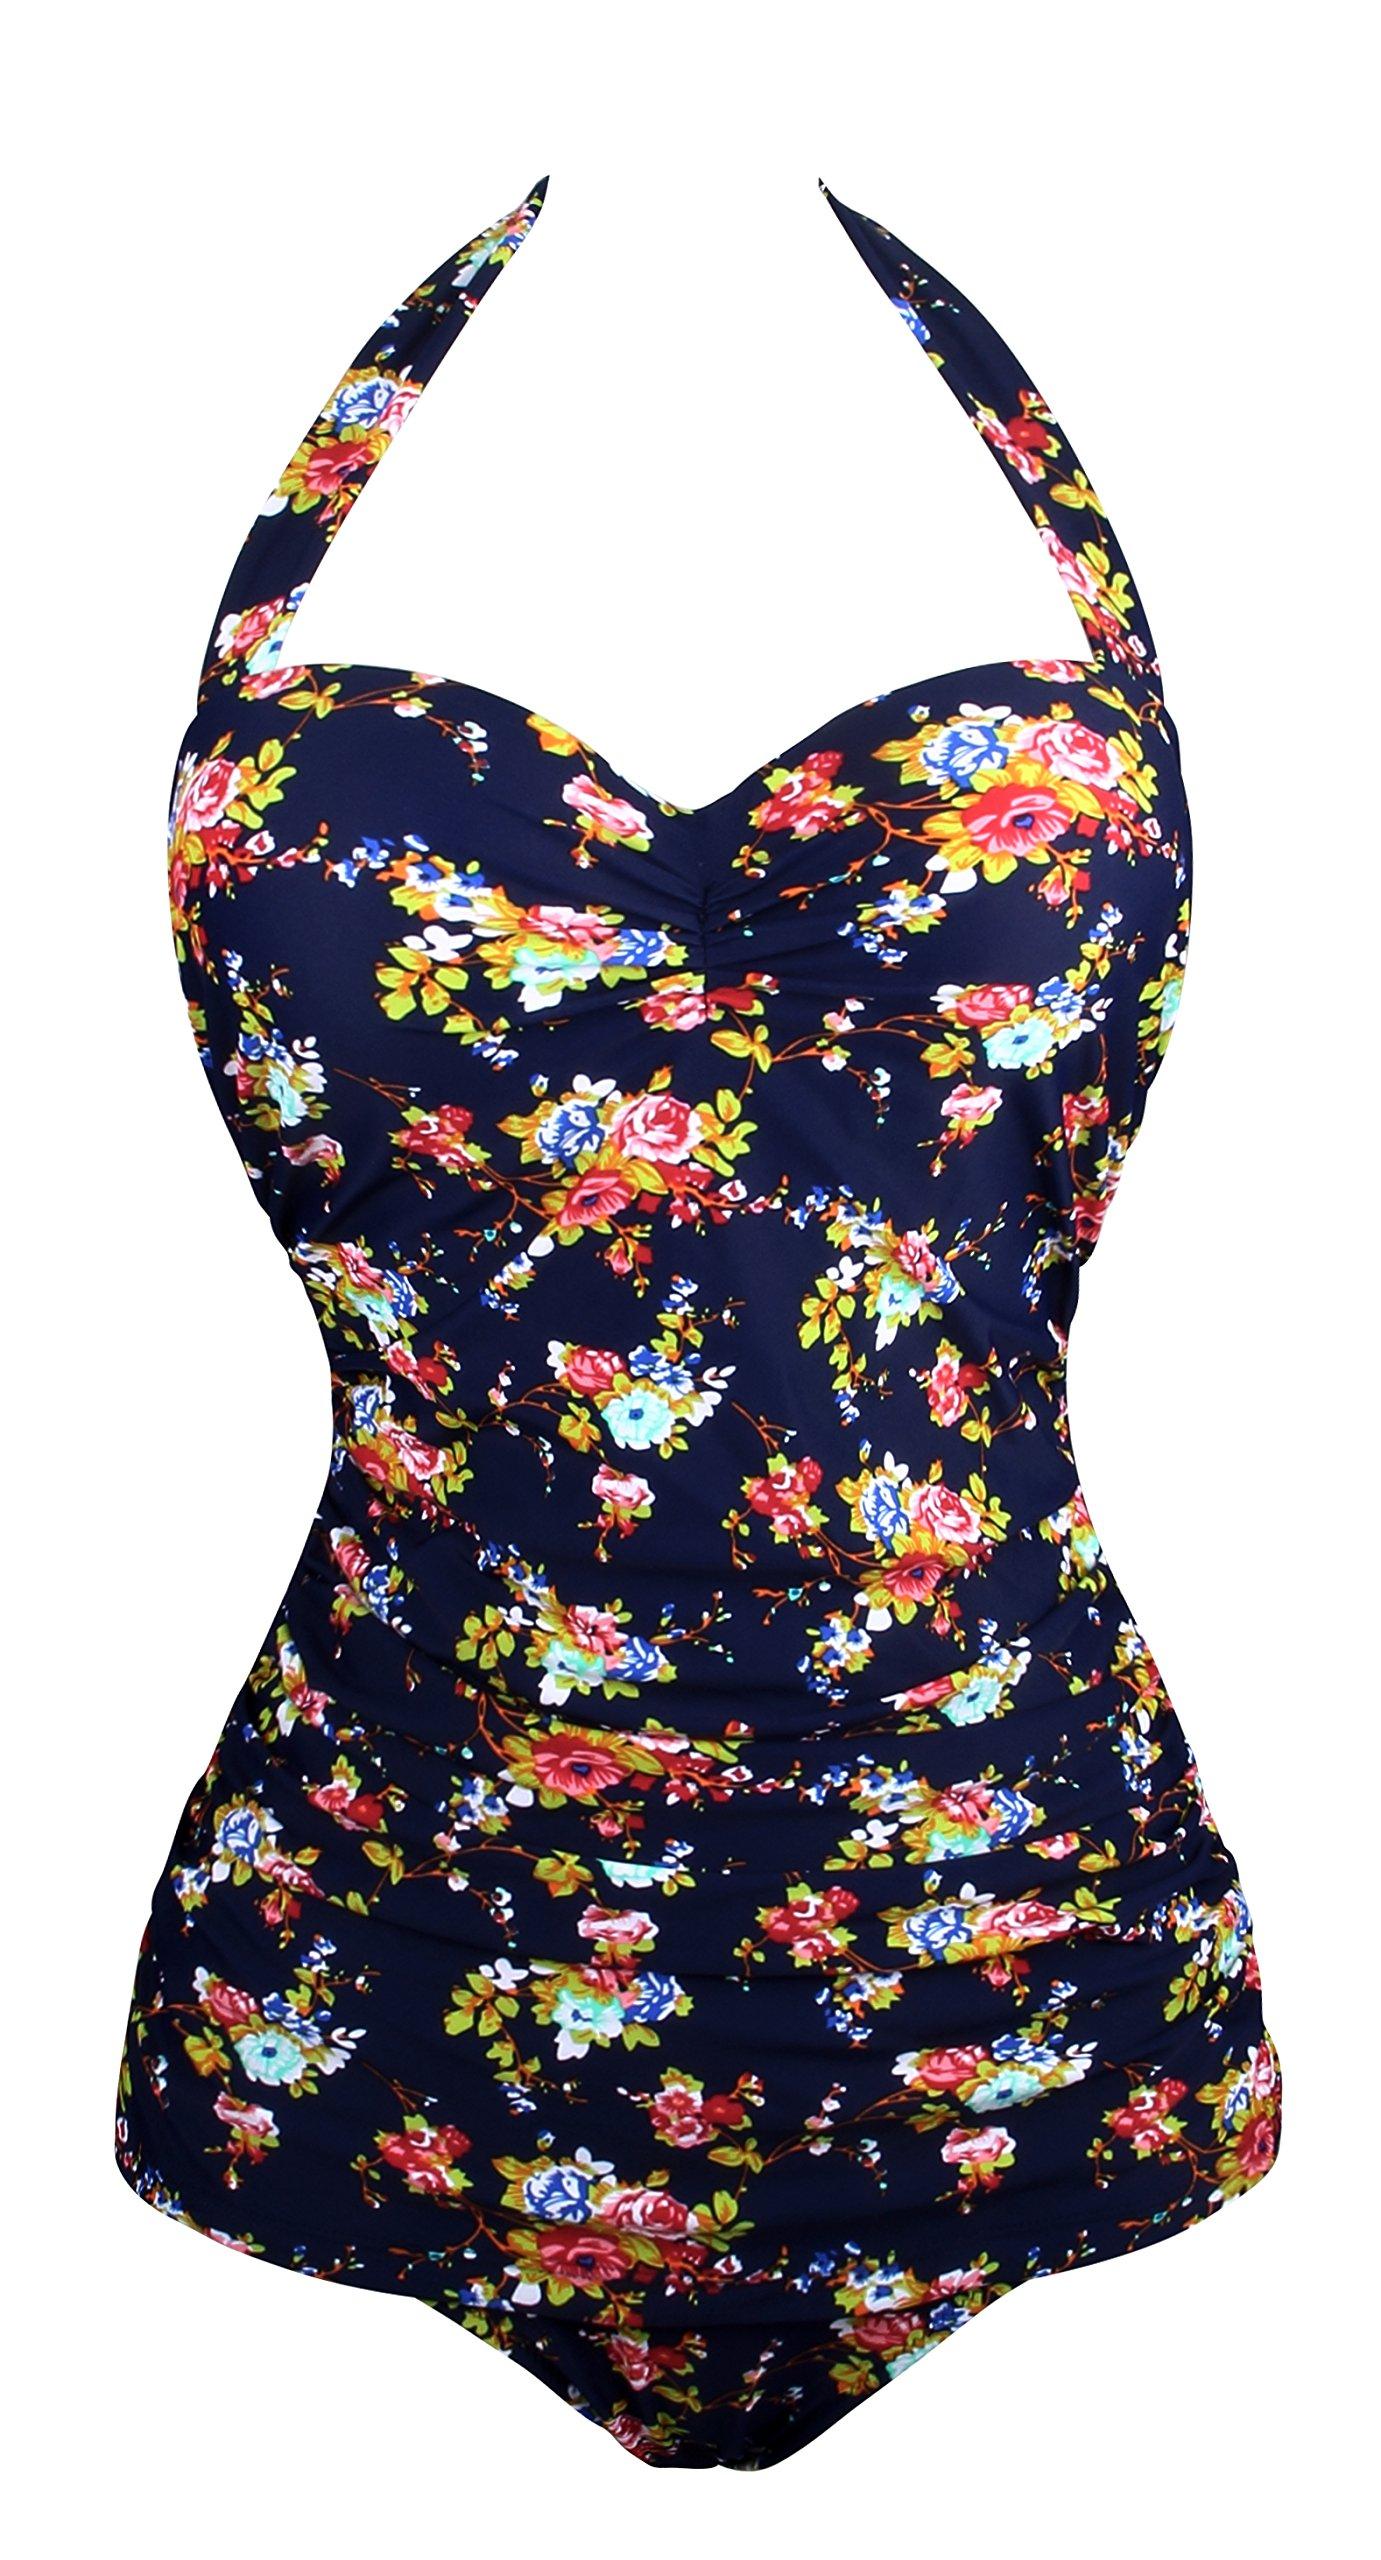 Angerella Vintage One Piece Pin Up Monokini Swimsuit Swimwear (SST045-N1-4XL)